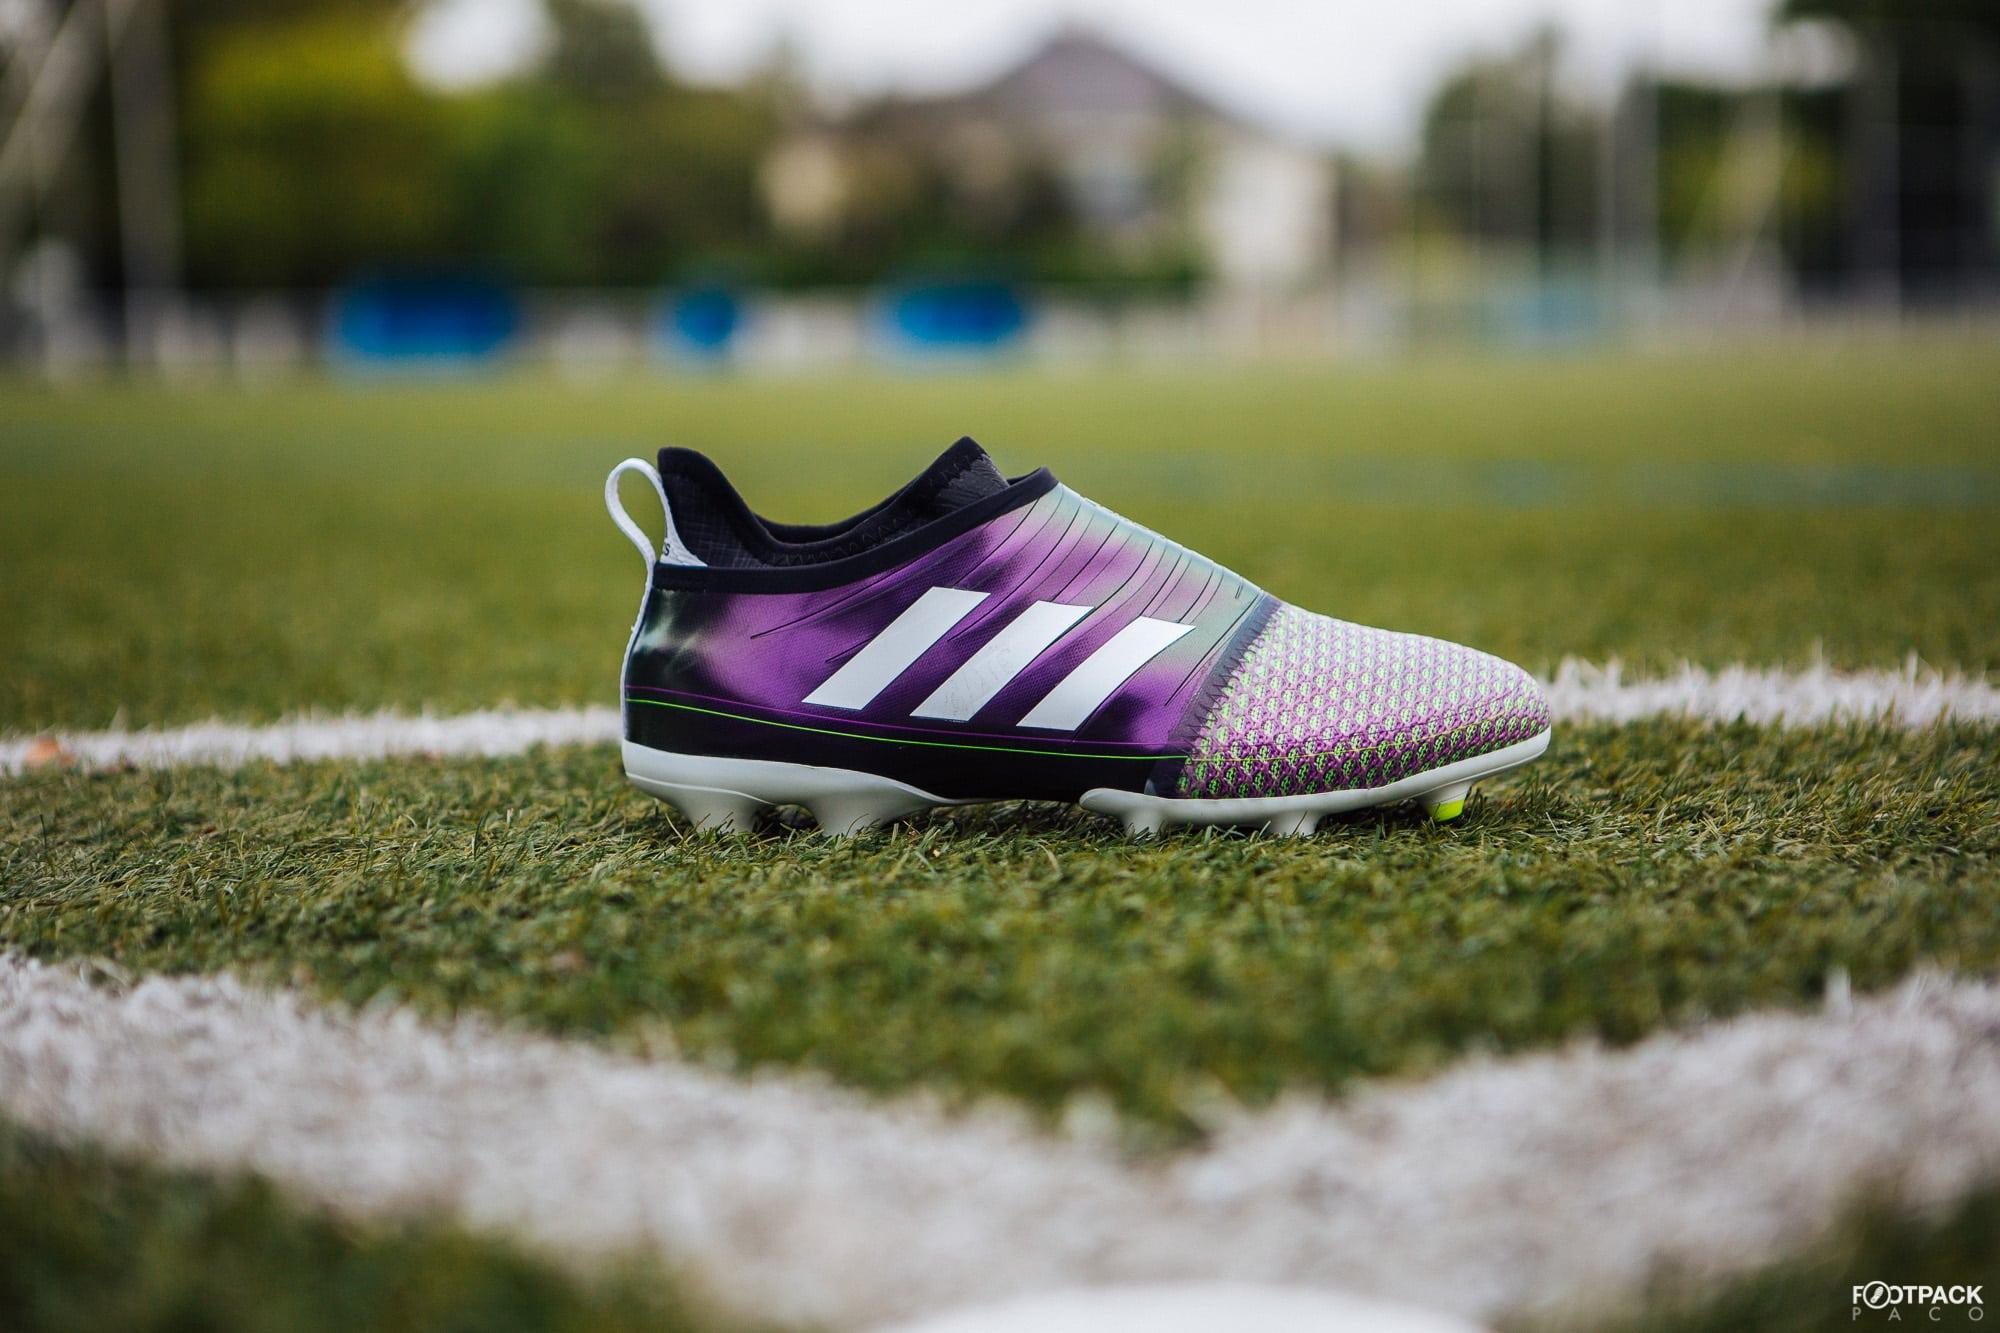 Chaussures-football-adidas-glitch-f50-mai-2018-2